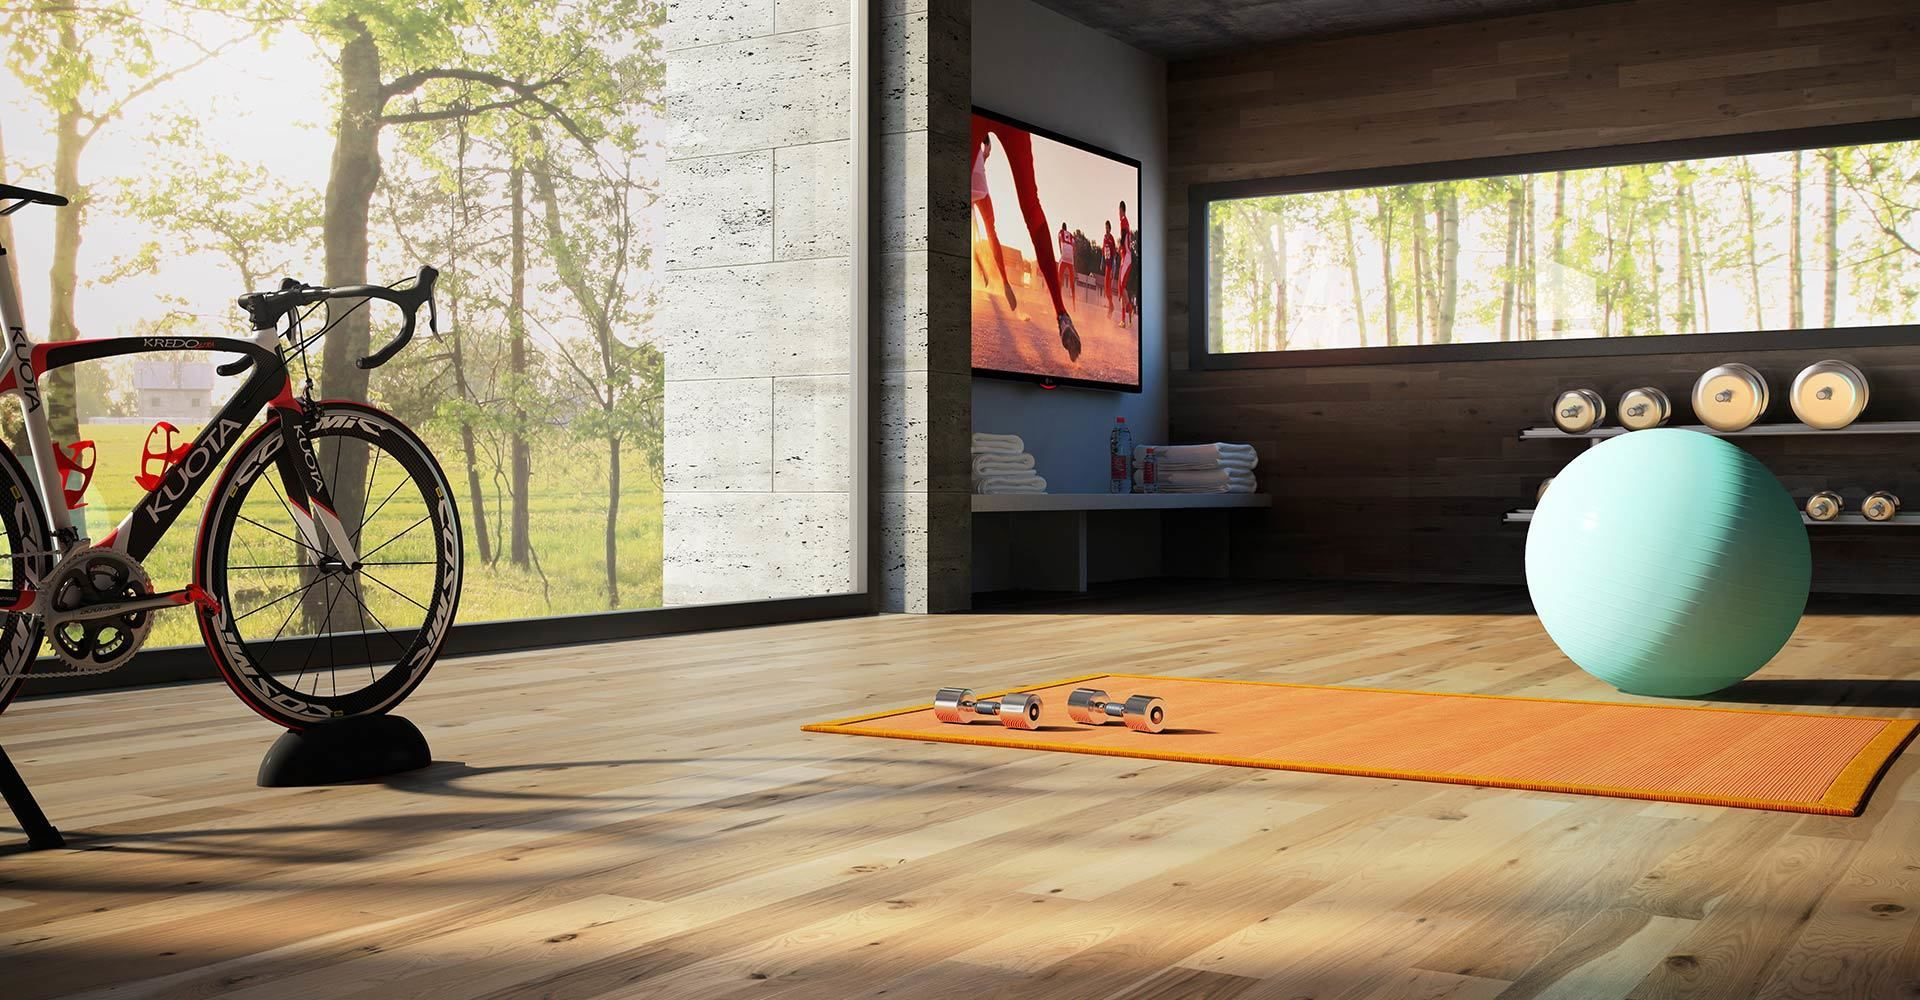 the hardwood flooring store of flooring retailer to get more information visit http thefloorshop intended for leading hardwood flooring store in the gta providing flooring installation